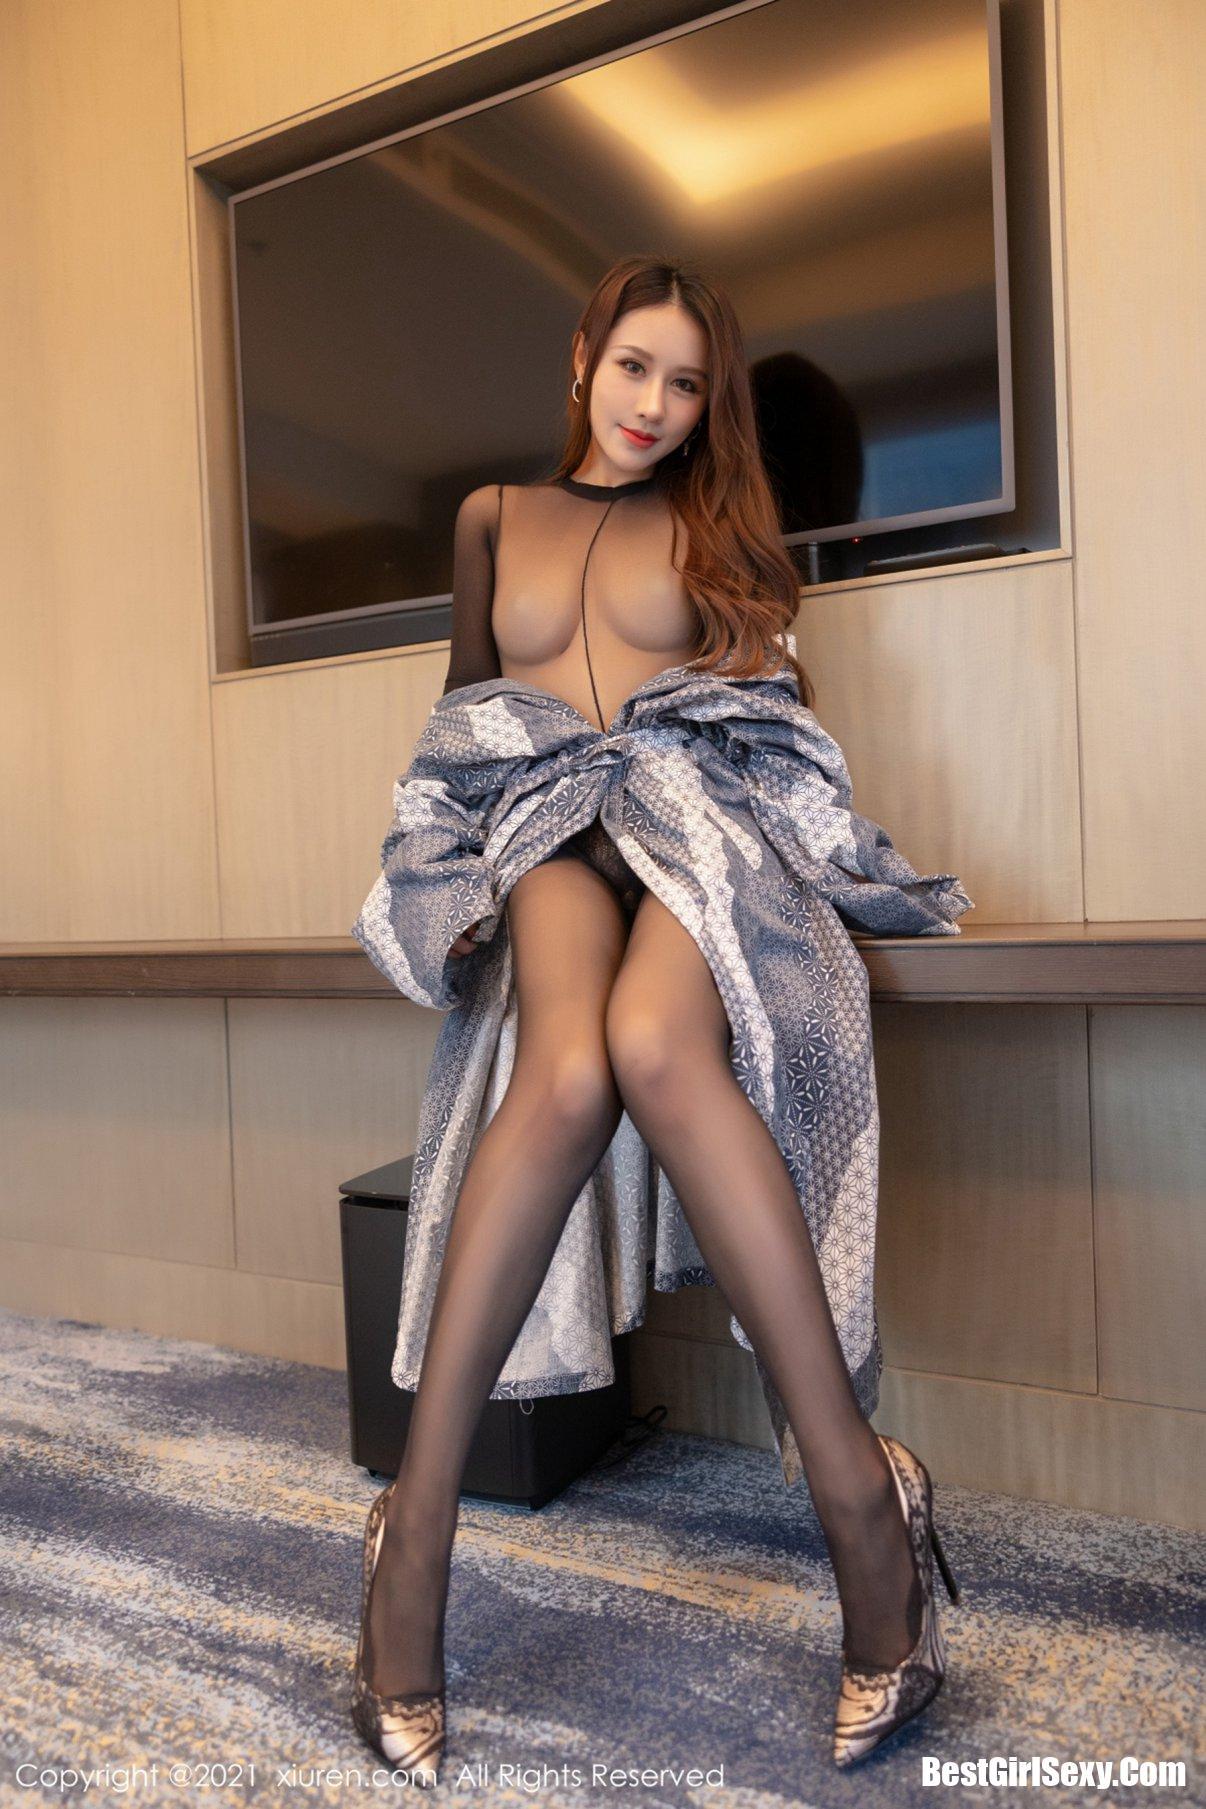 徐安安, Xu An An, XiuRen秀人网 No.3433 Xu An An, XiuRen秀人网 No.3433